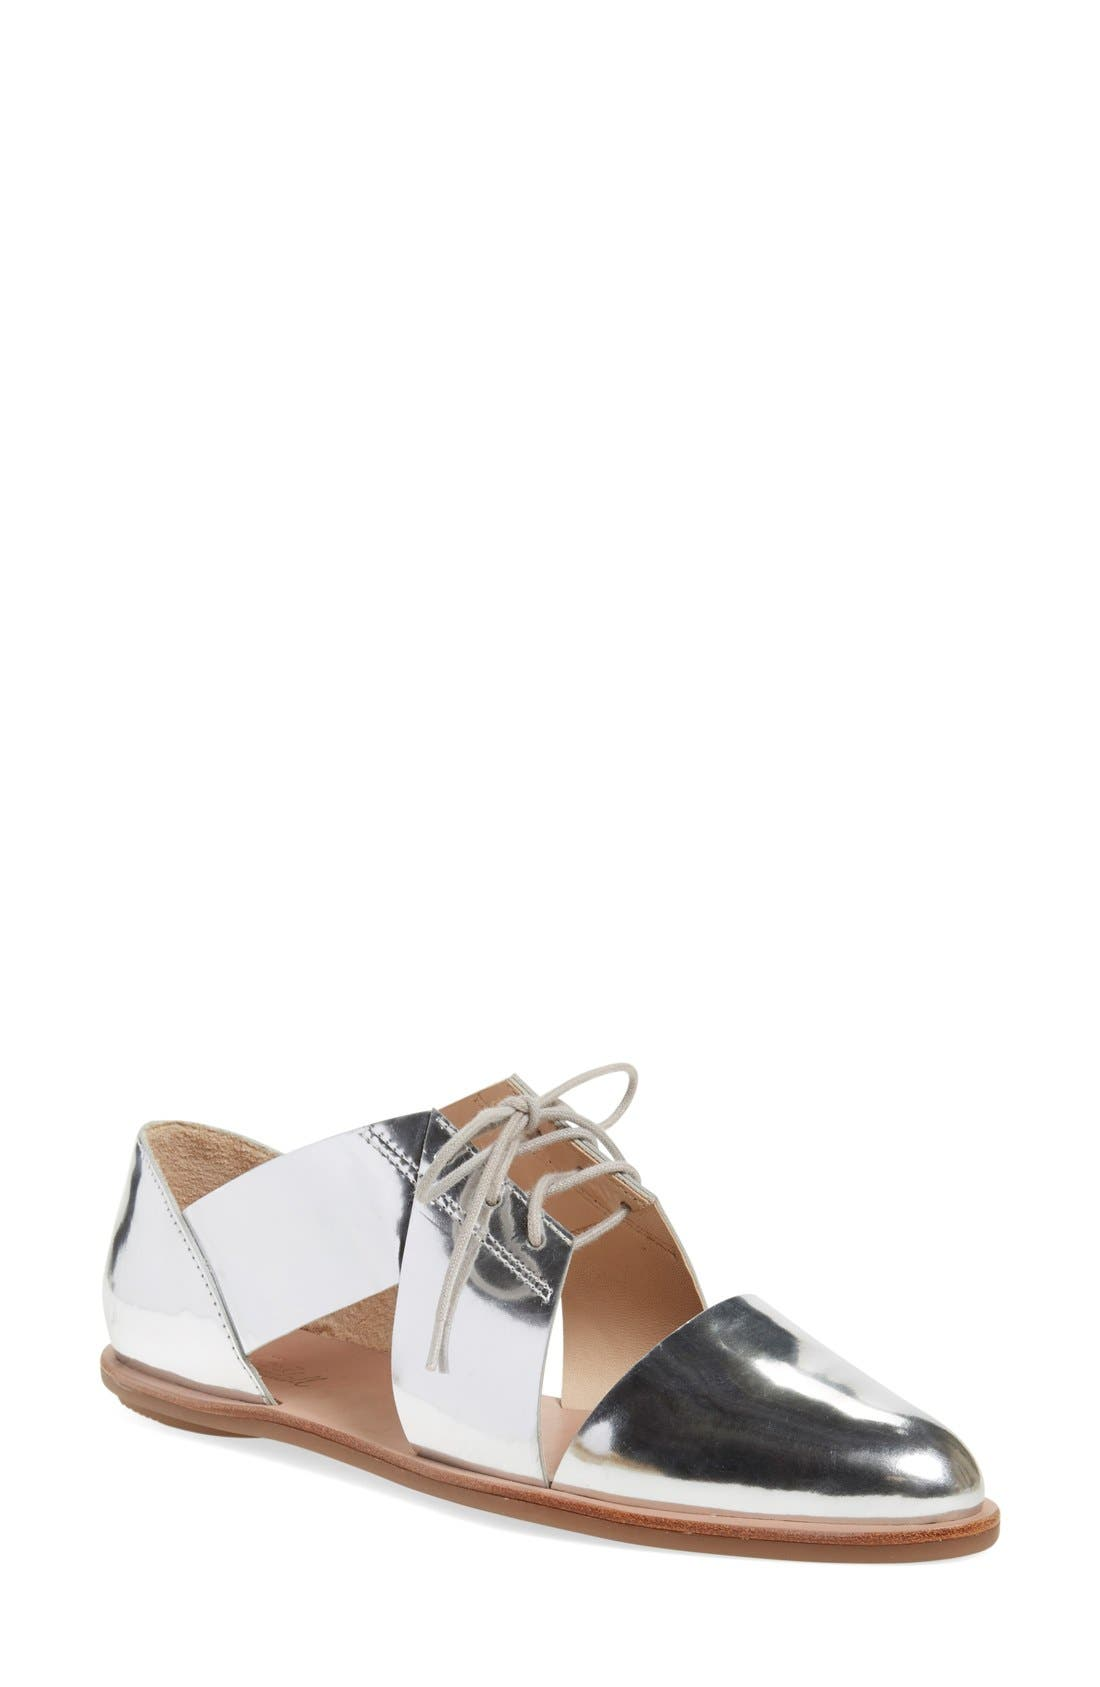 'Willa' Flat,                         Main,                         color, Silver Mirror Leather